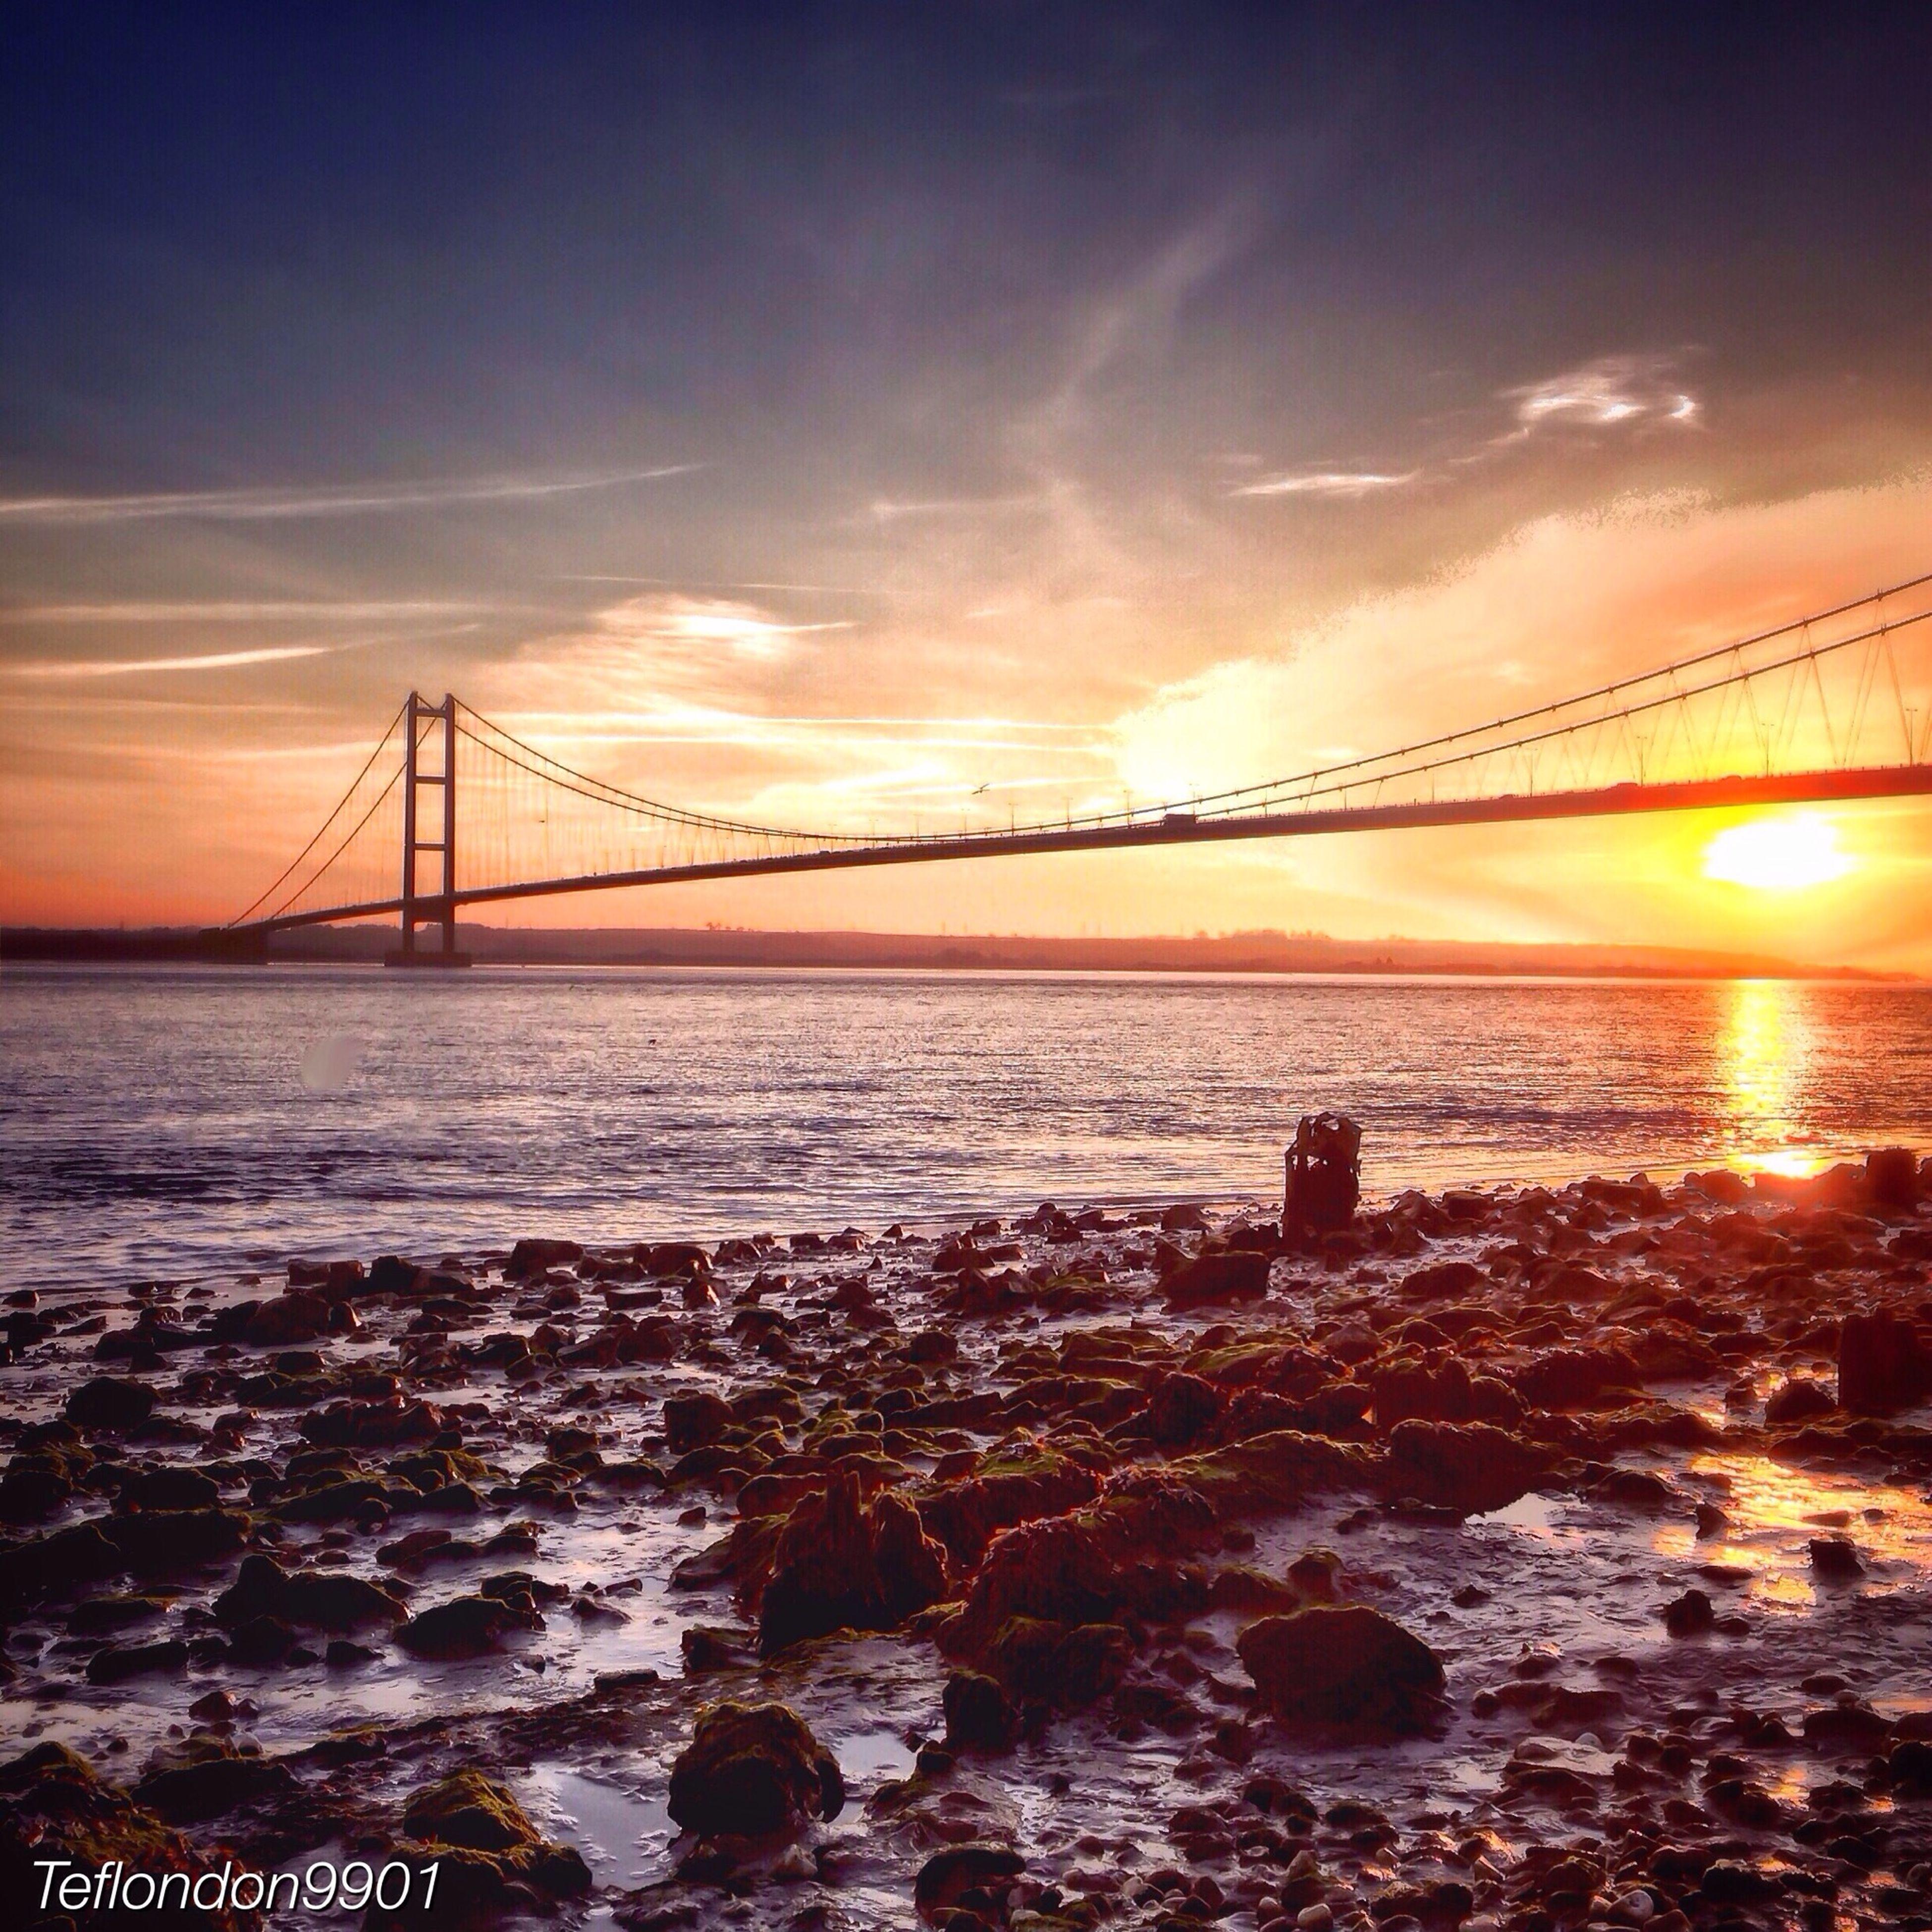 sunset, connection, water, bridge - man made structure, sun, sky, suspension bridge, orange color, scenics, engineering, sea, beauty in nature, silhouette, built structure, tranquil scene, tranquility, bridge, nature, river, sunbeam